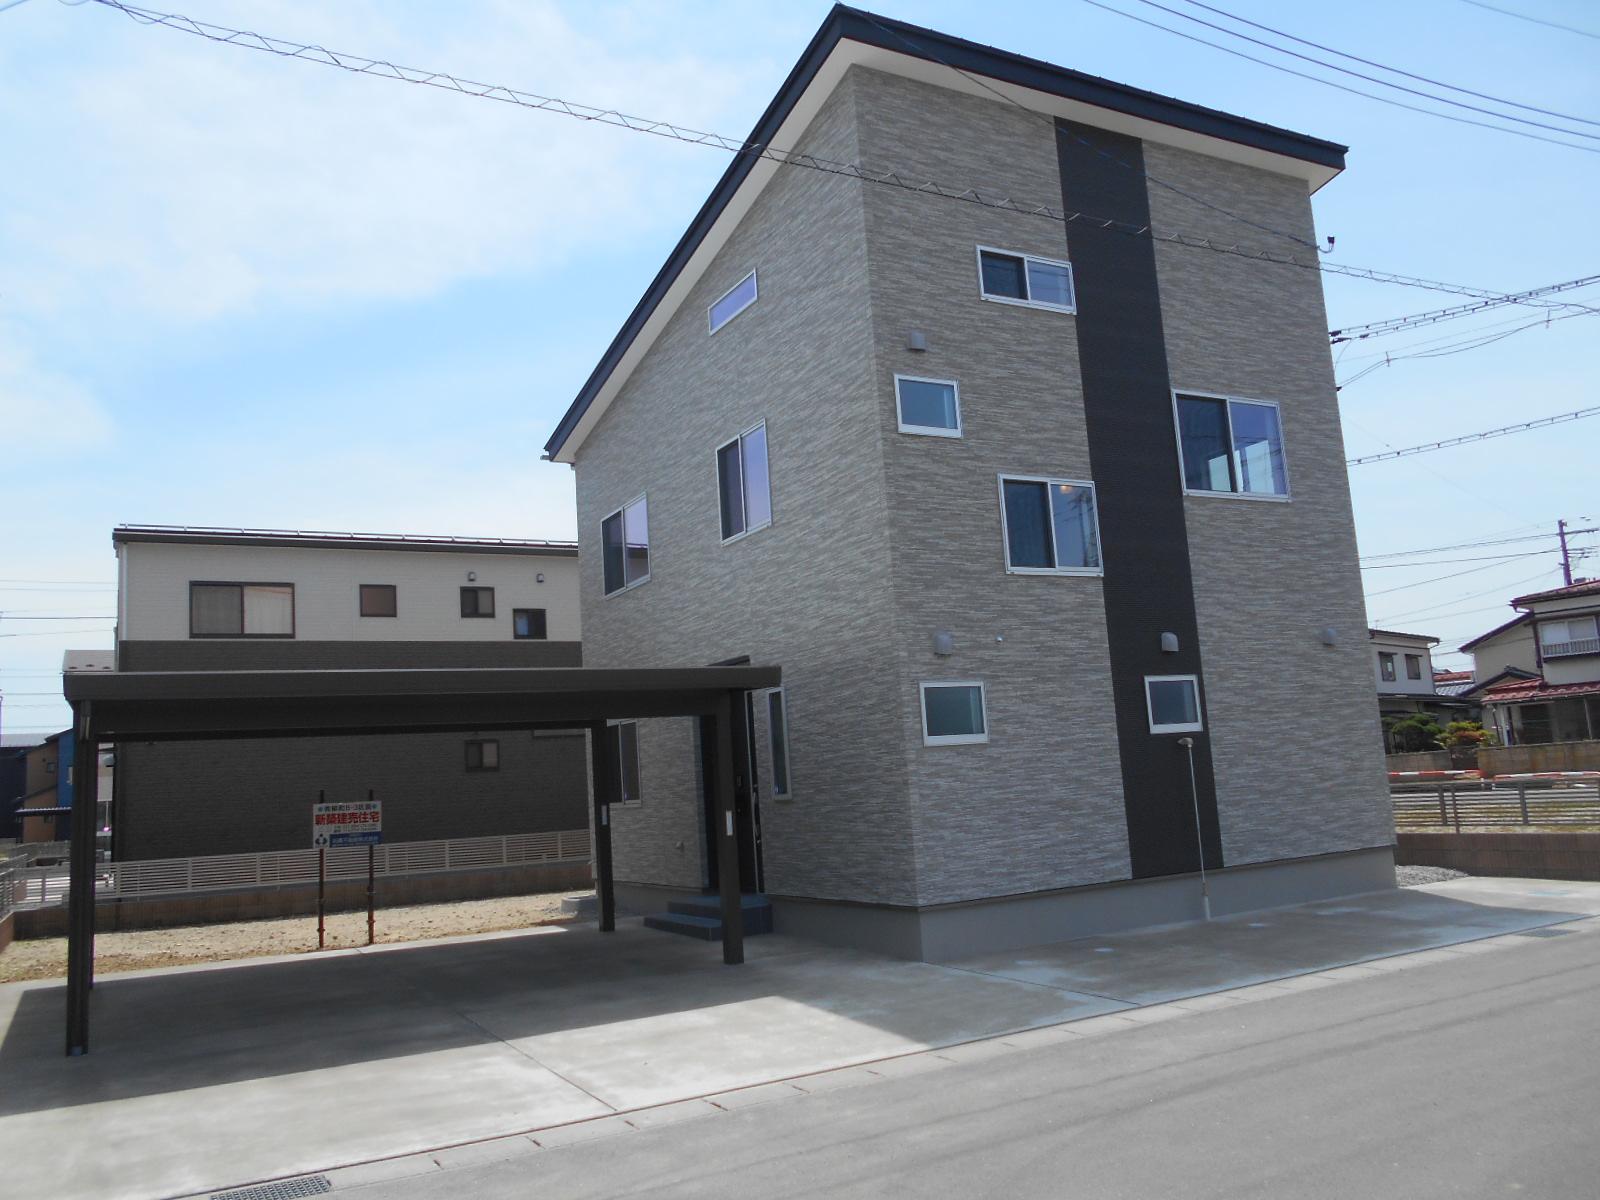 Blue Willow おもいやりの街 B-3区画 建売住宅&分譲地 販売会のお知らせ